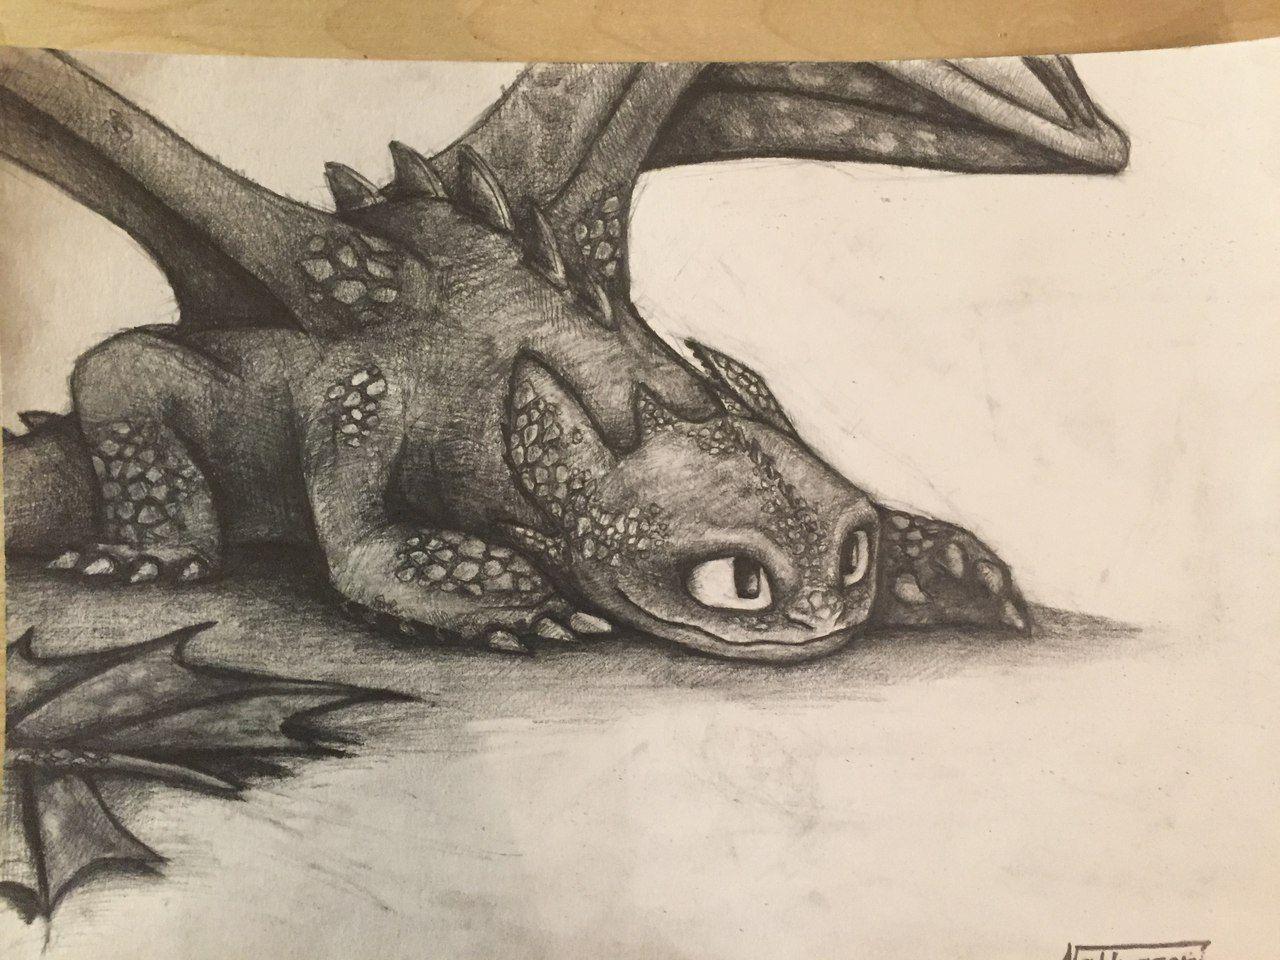 Pin By Keylan Gryp On Kak Priruchit Drakona Httyd Art How To Train Your Dragon How Train Your Dragon